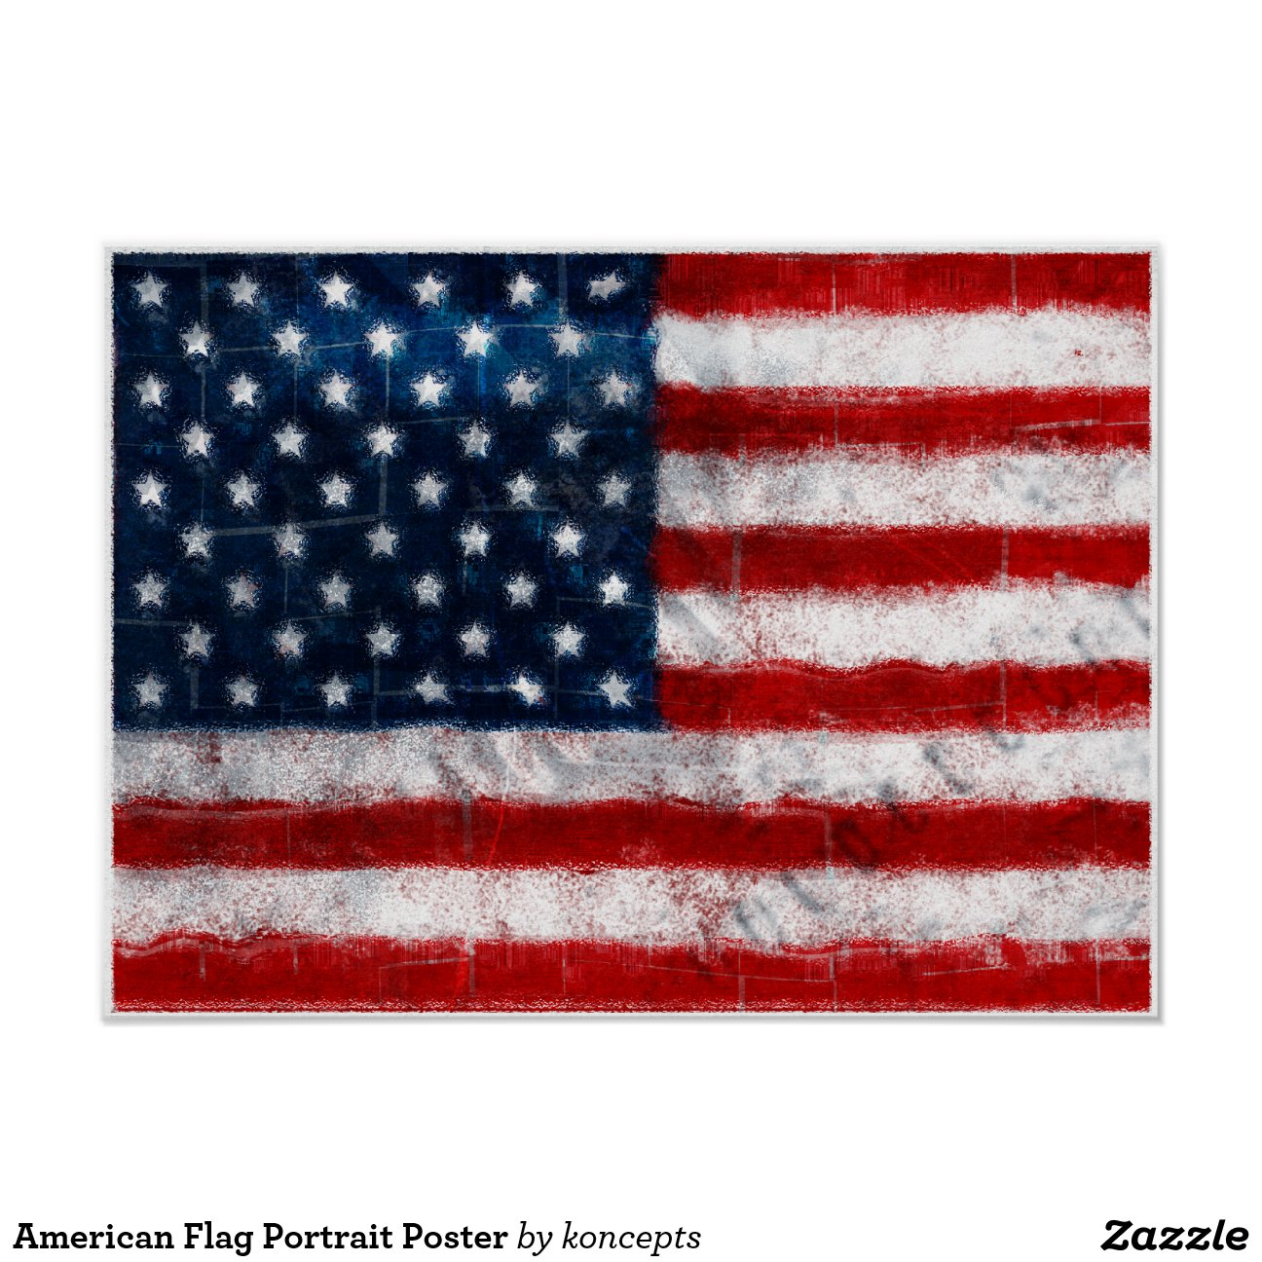 American Flag Portrait Poster